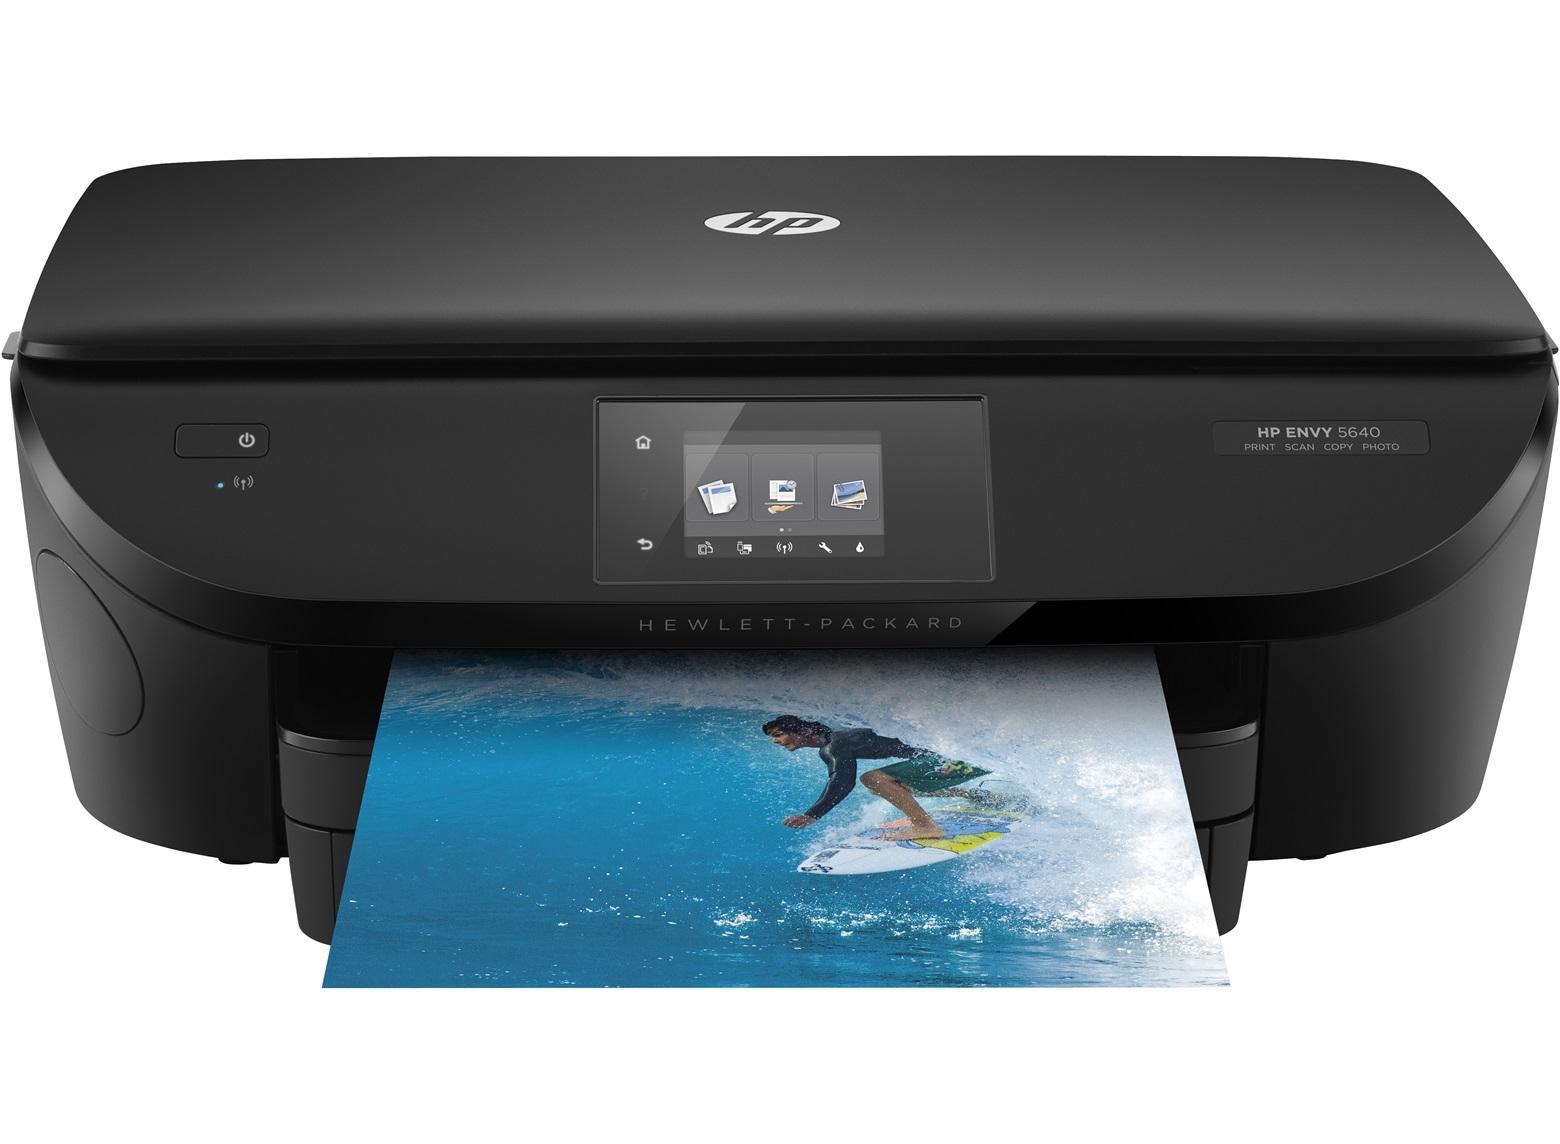 HP ENVY 5640 e-AiO 4800 x 1200DPI Inkjet A4 12ppm Wi-Fi Black multifunctional